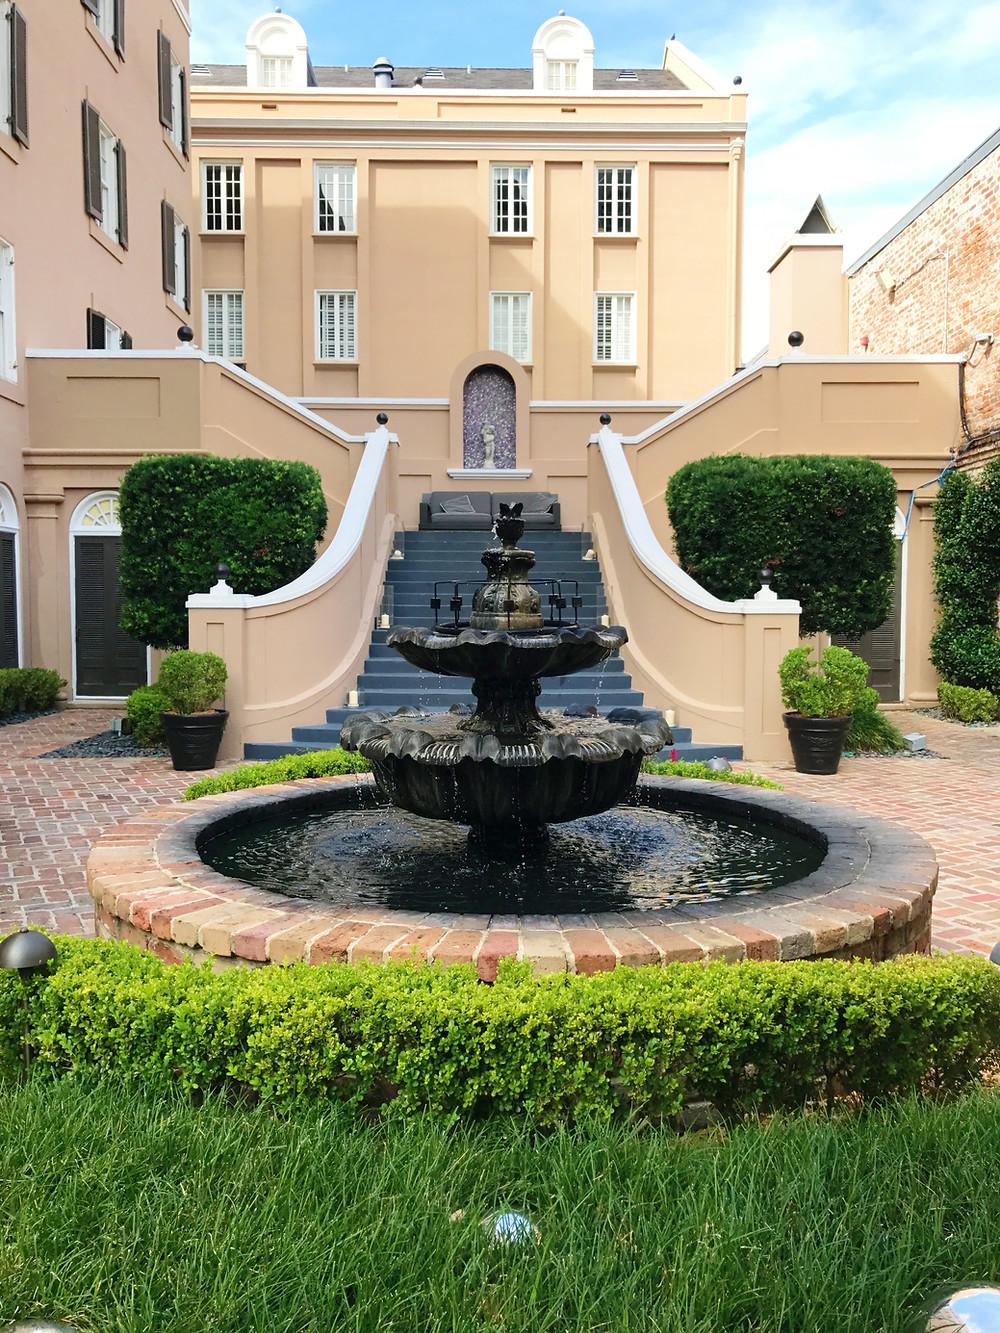 W Hotel French Quarter Courtyard I New Orleans Travel Guide I Nicole Riccardo